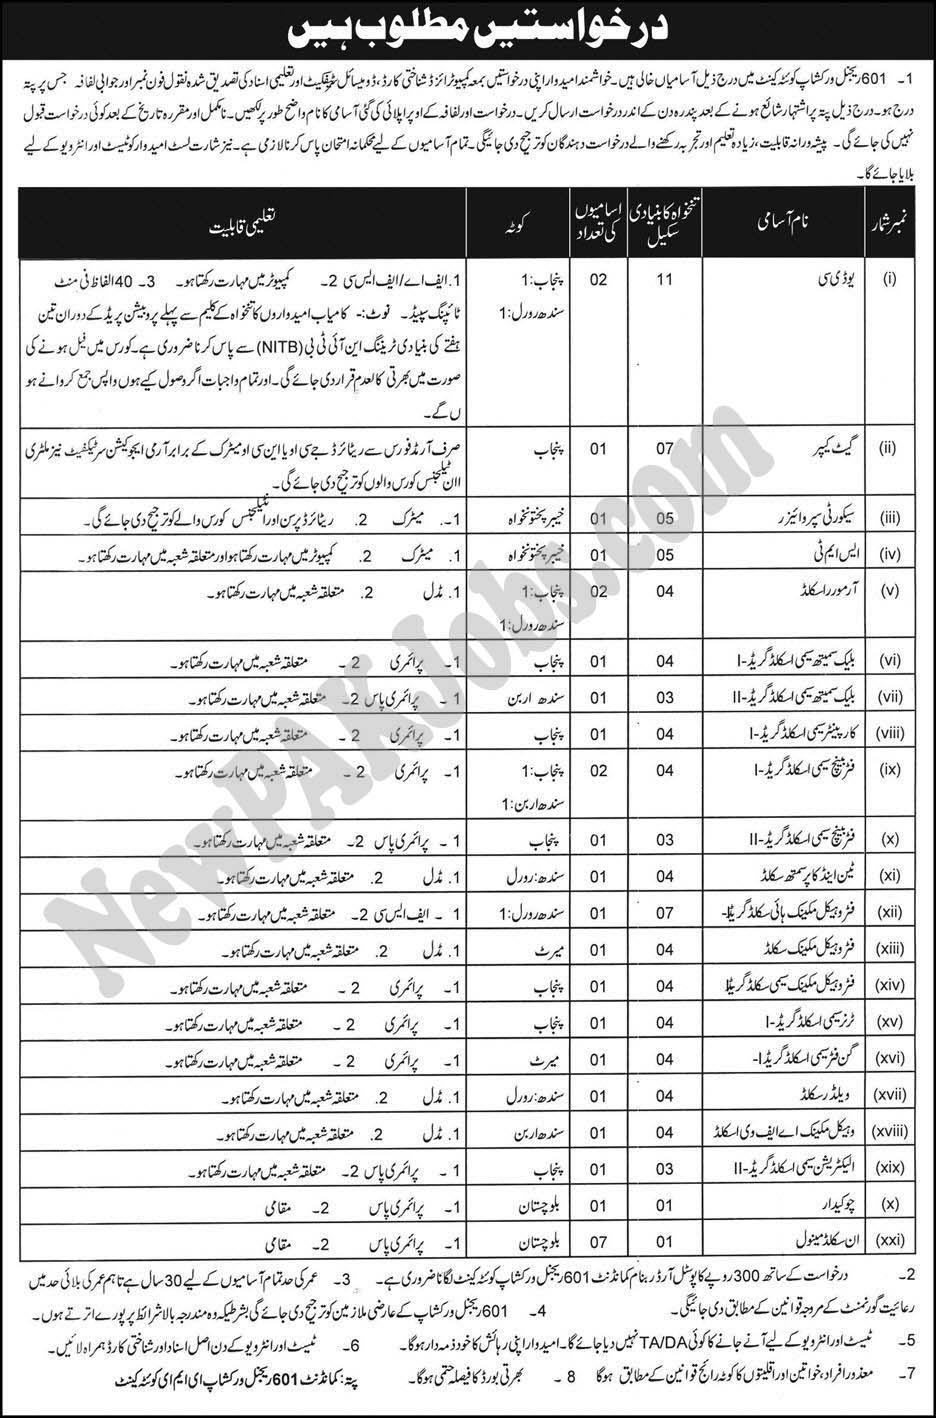 Latest Jobs under Pak Army 601 Regional Workshop Quetta Cantt